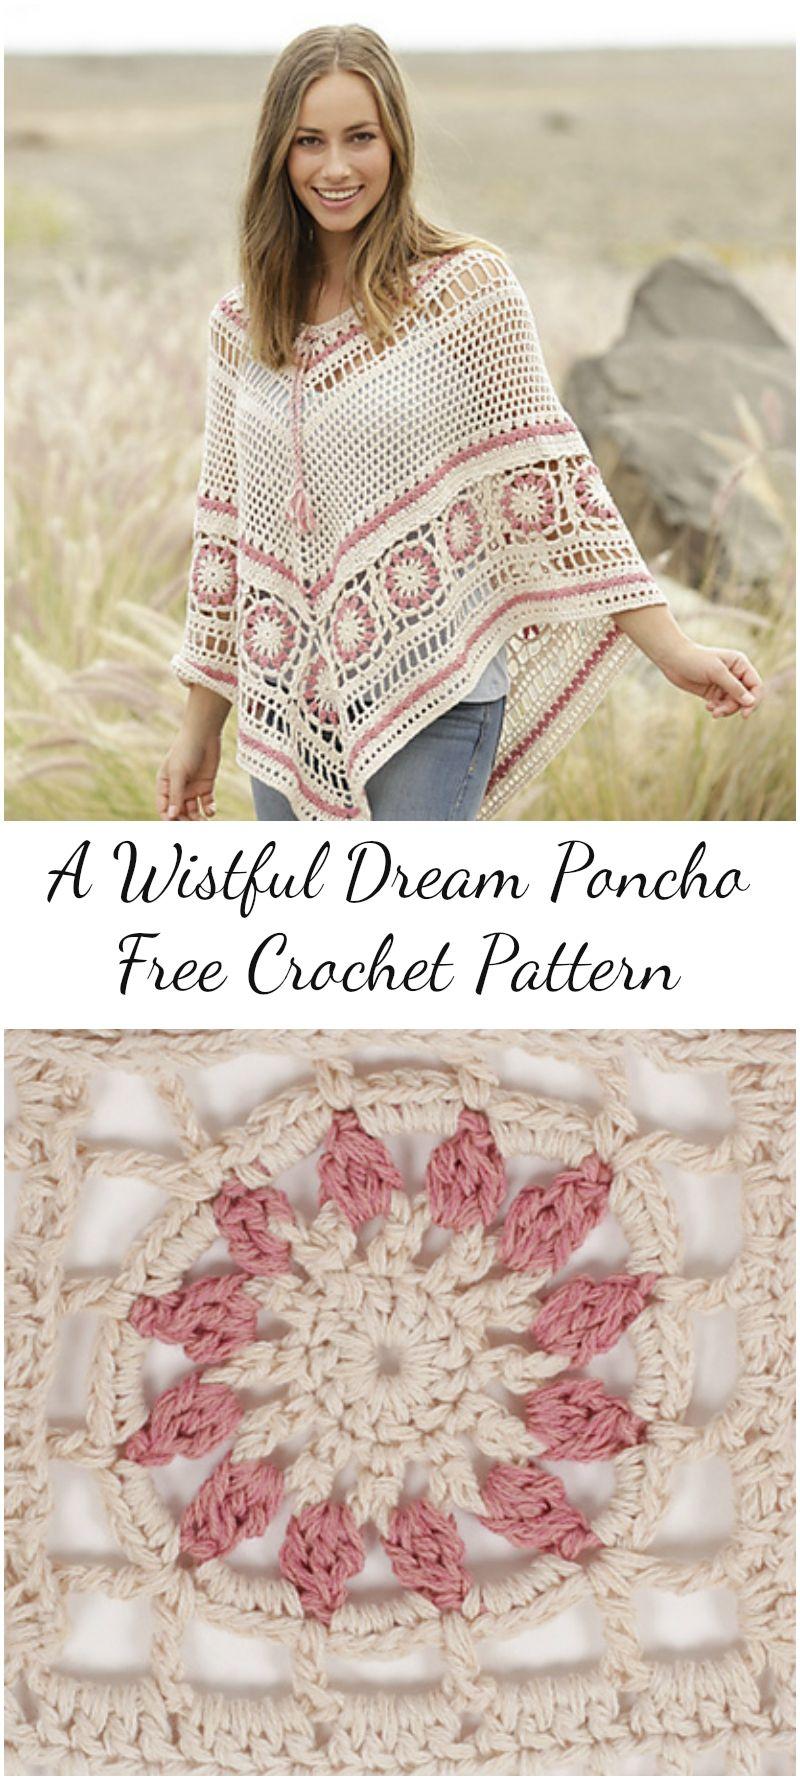 A Wistful Dream Poncho – Free Crochet Pattern: Visit pattern site ...